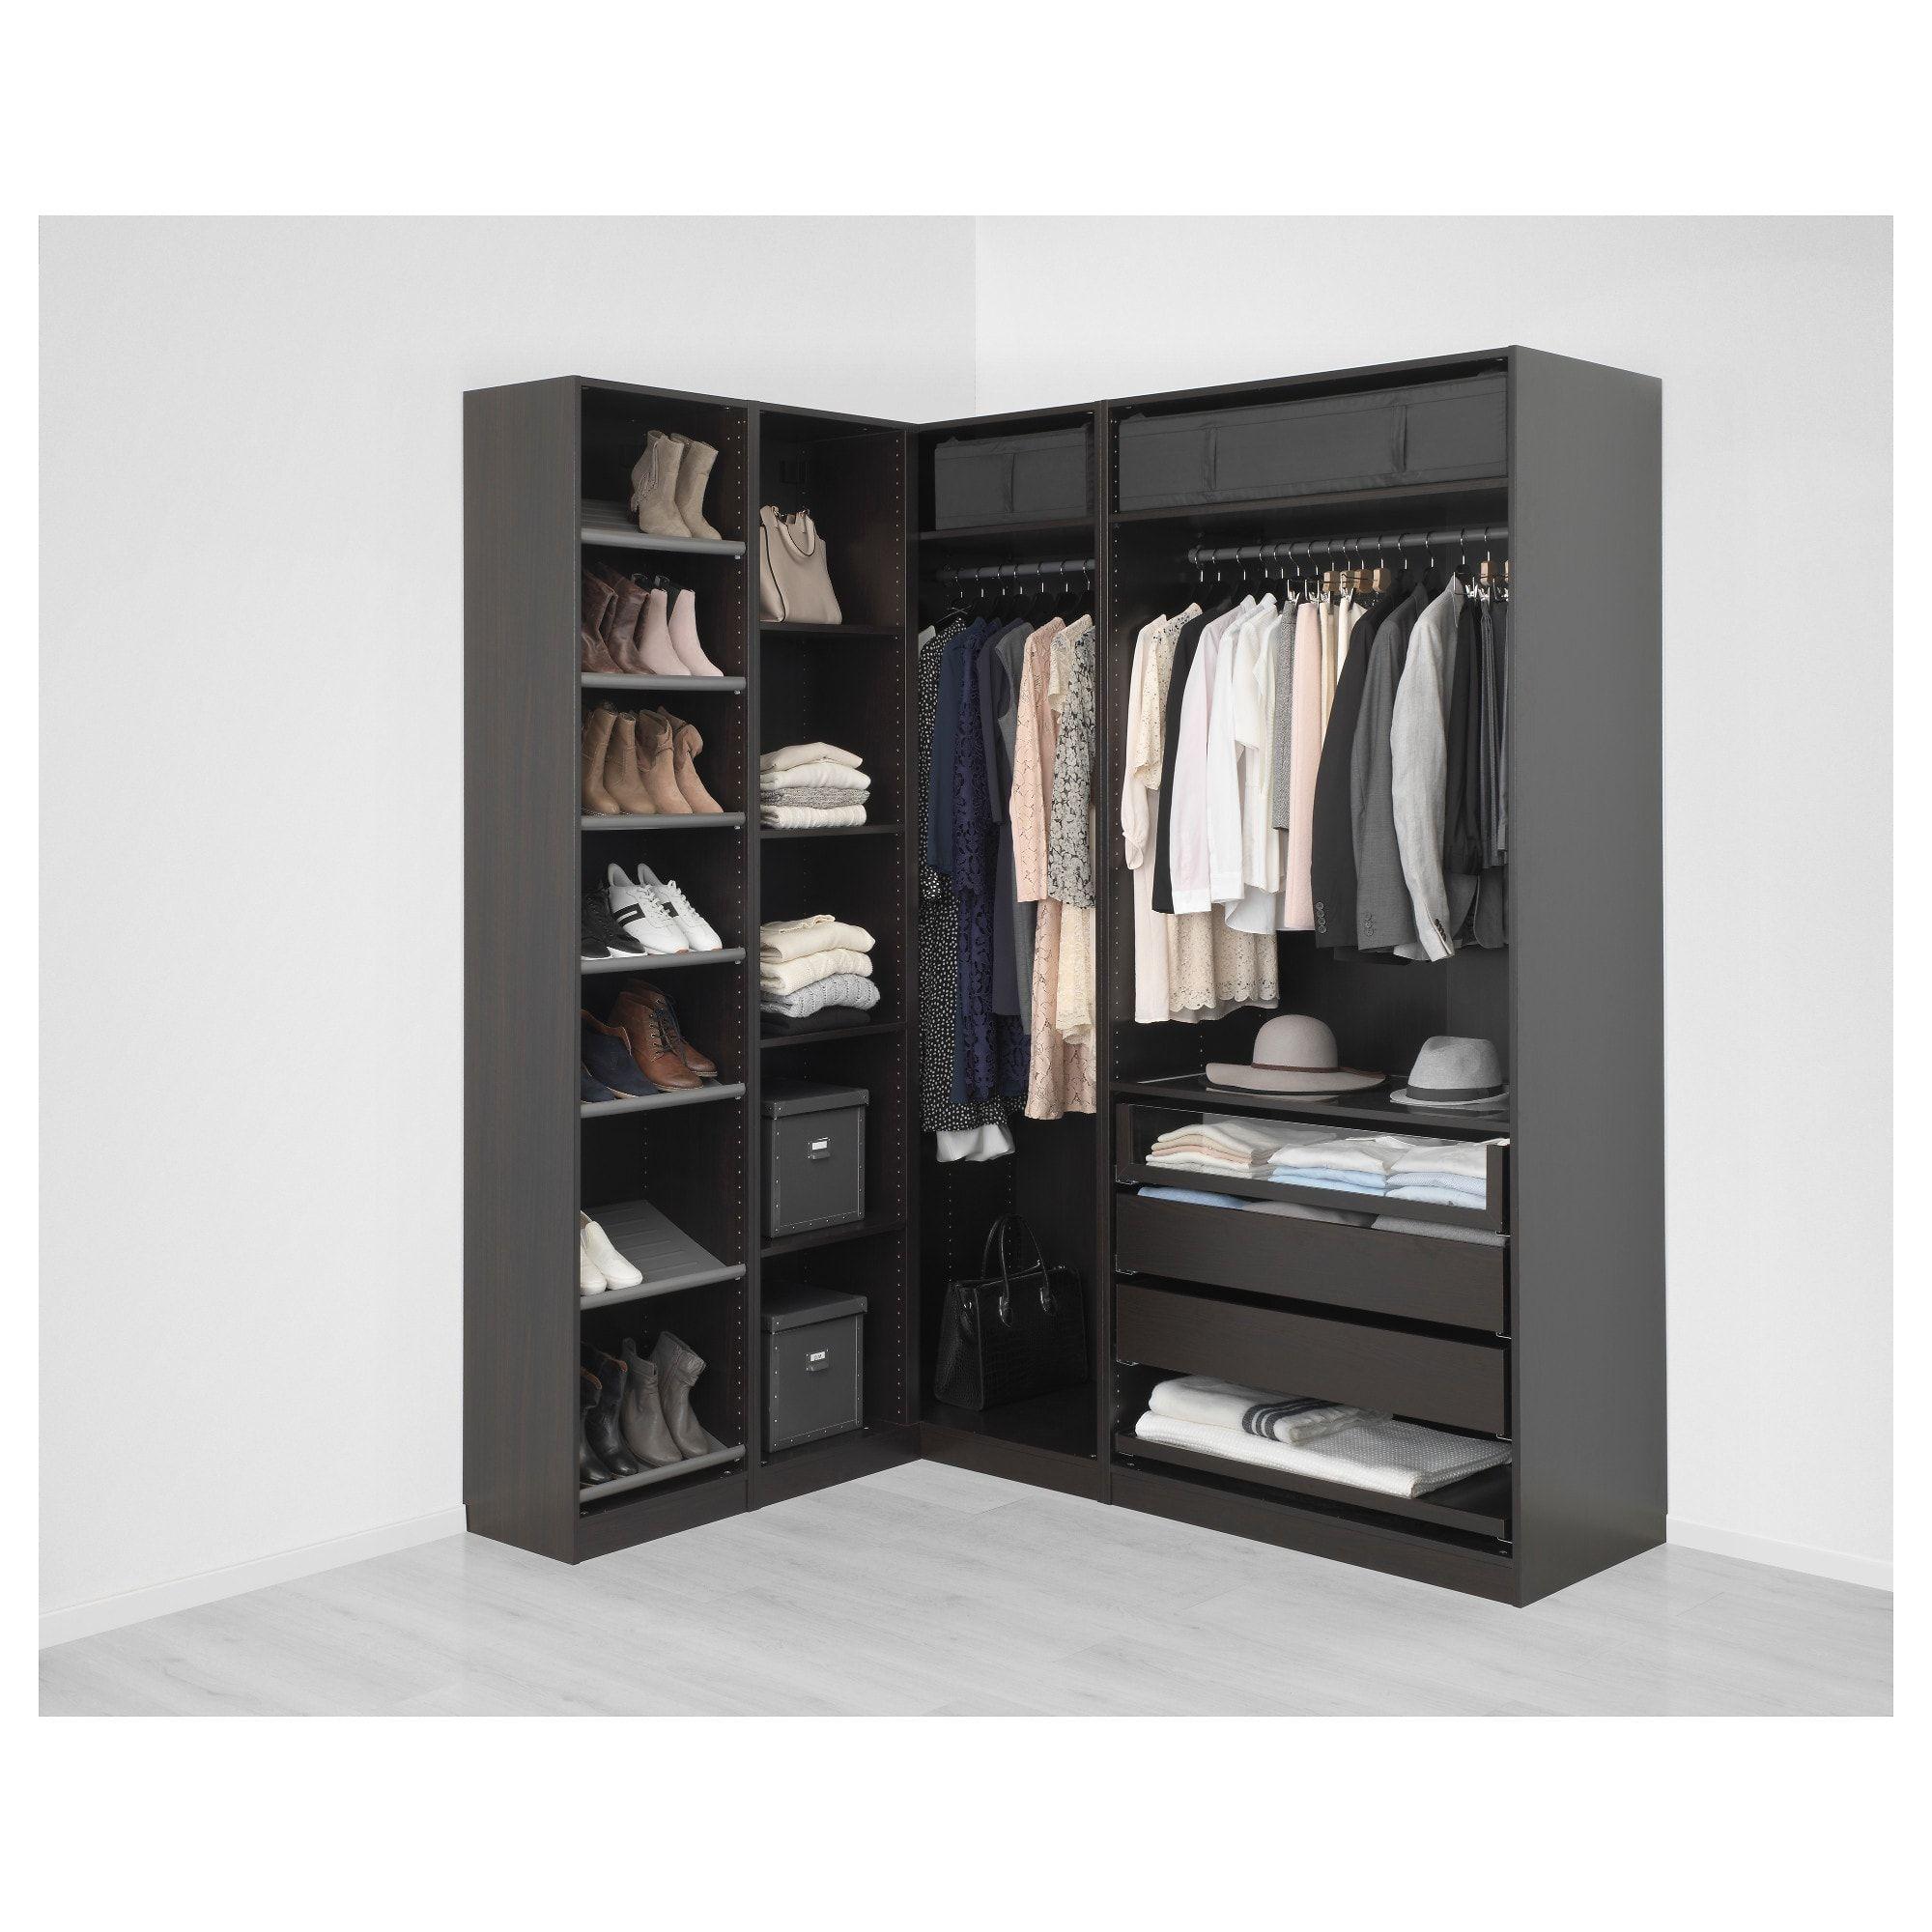 Ikea Us Furniture And Home Furnishings In 2020 Corner Wardrobe Pax Corner Wardrobe Ikea Pax